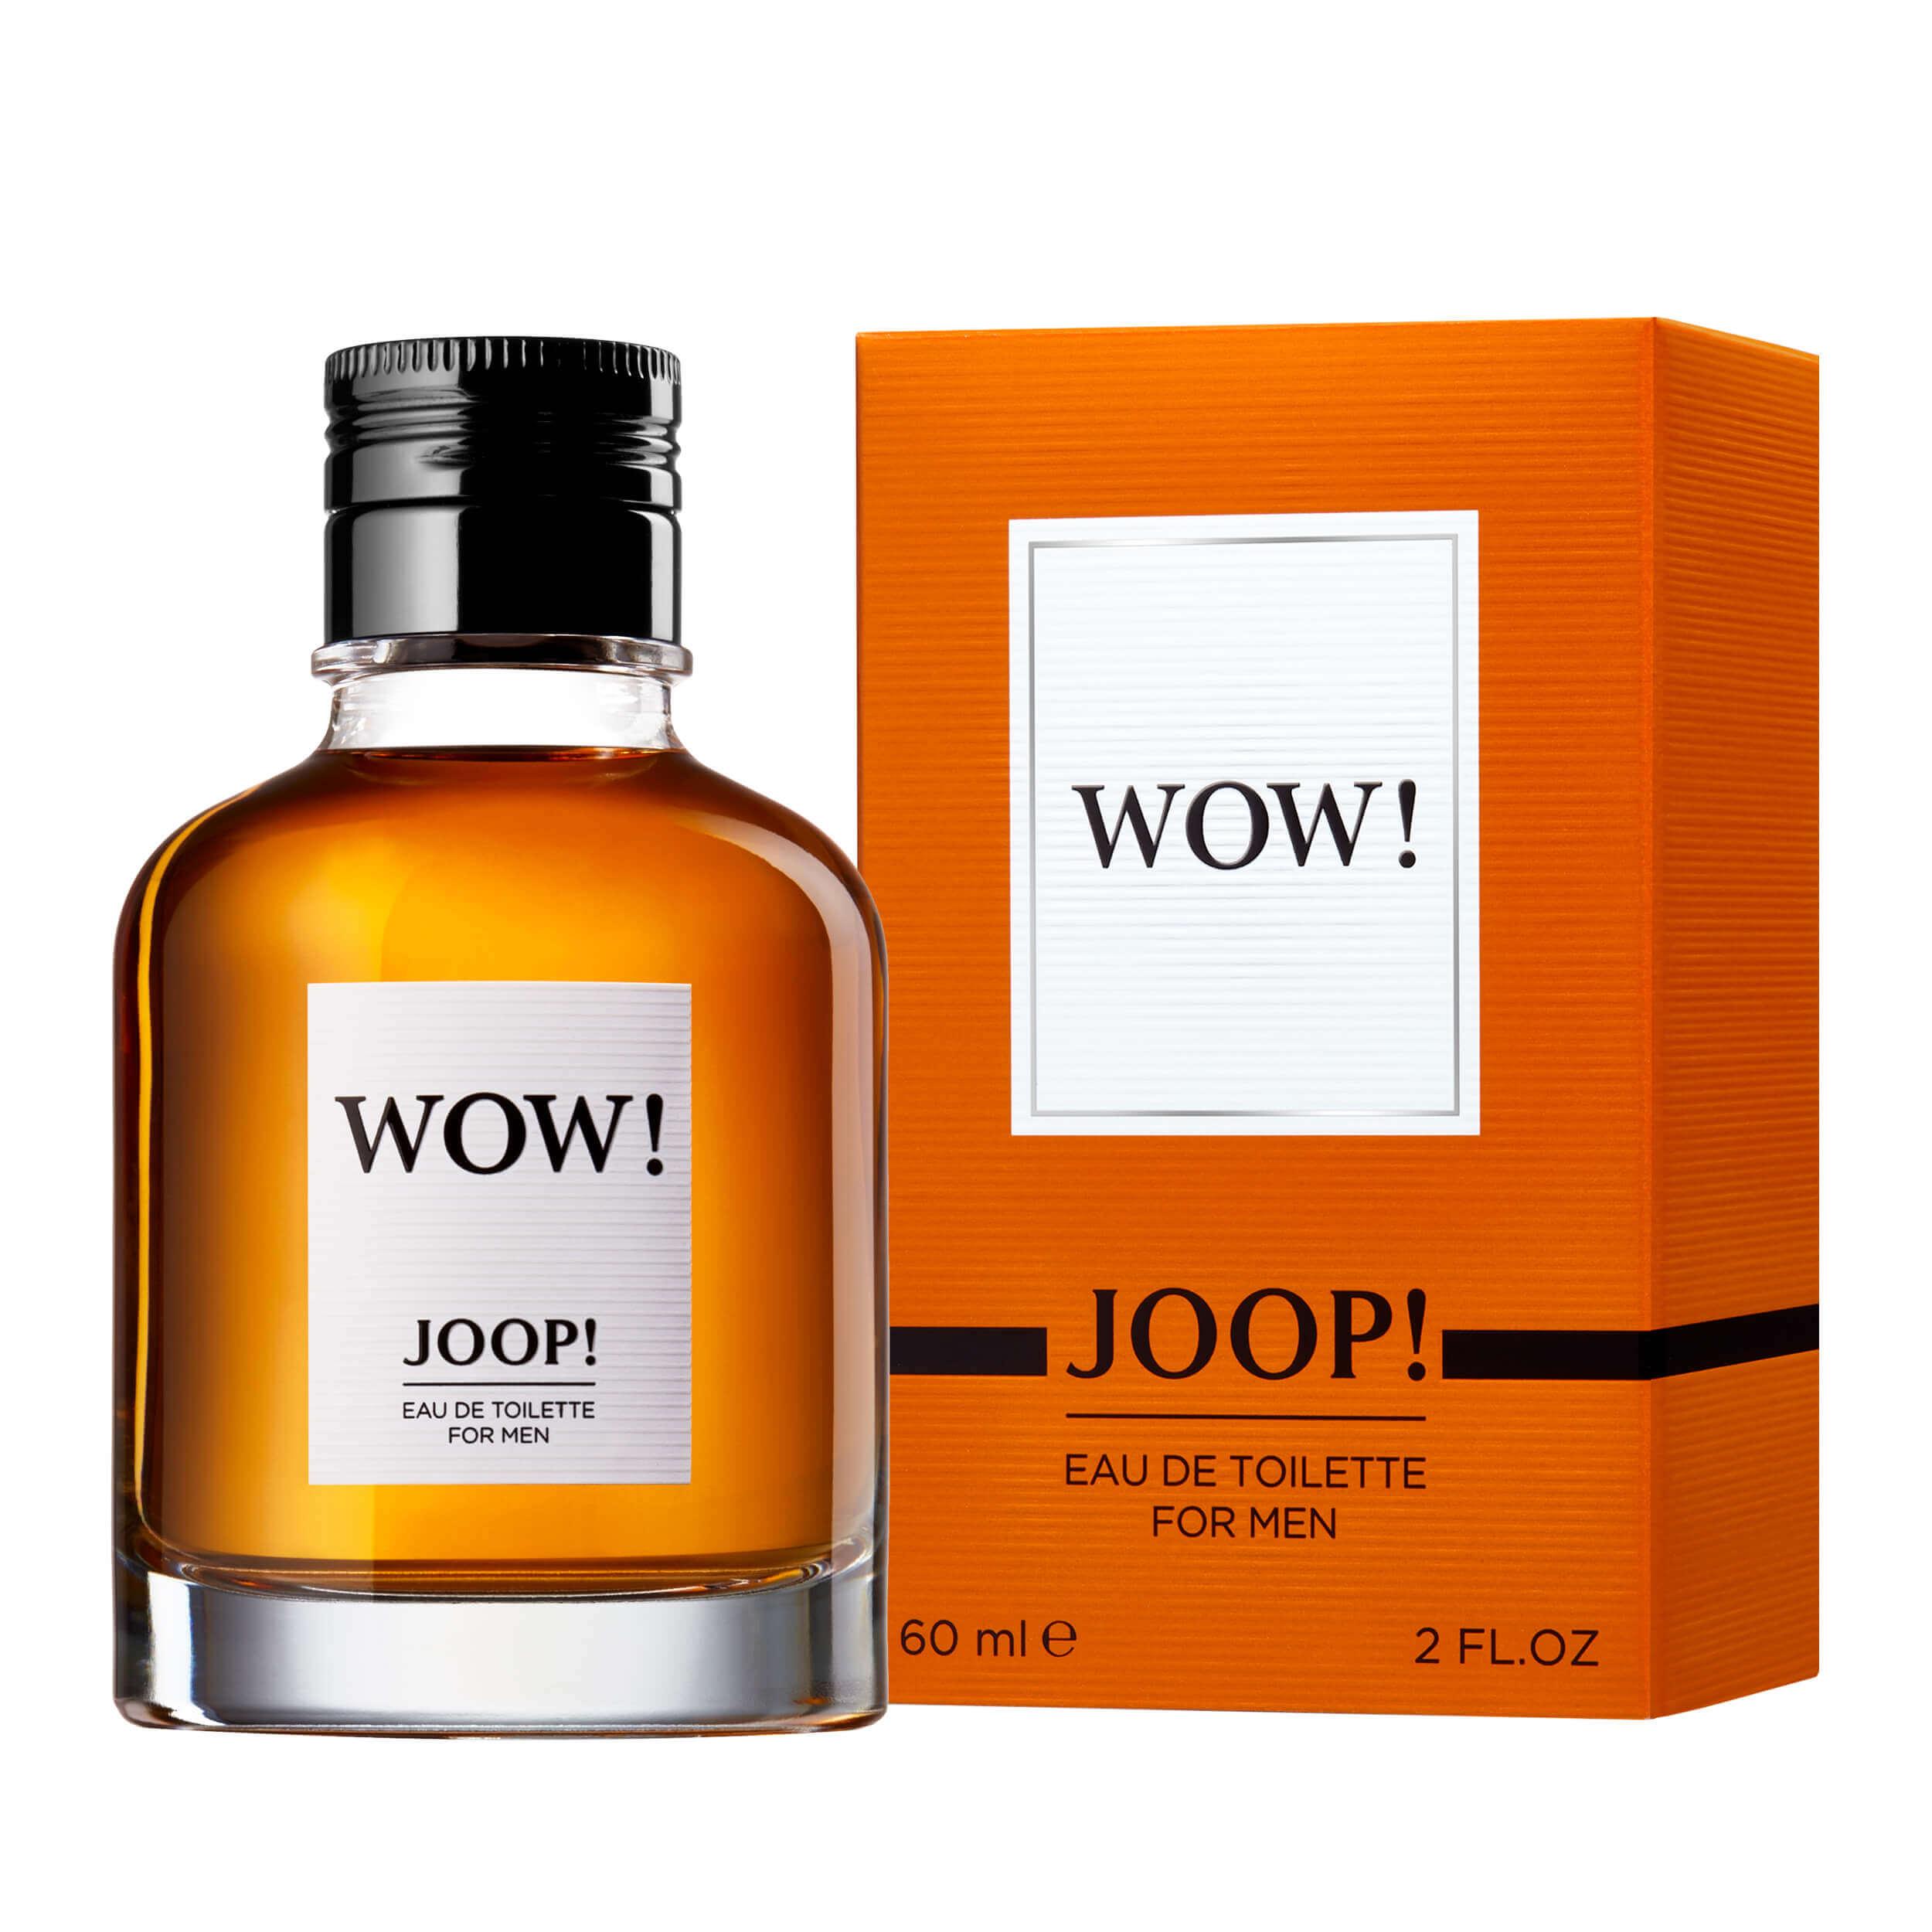 joop wow eau de toilette 60ml spray. Black Bedroom Furniture Sets. Home Design Ideas